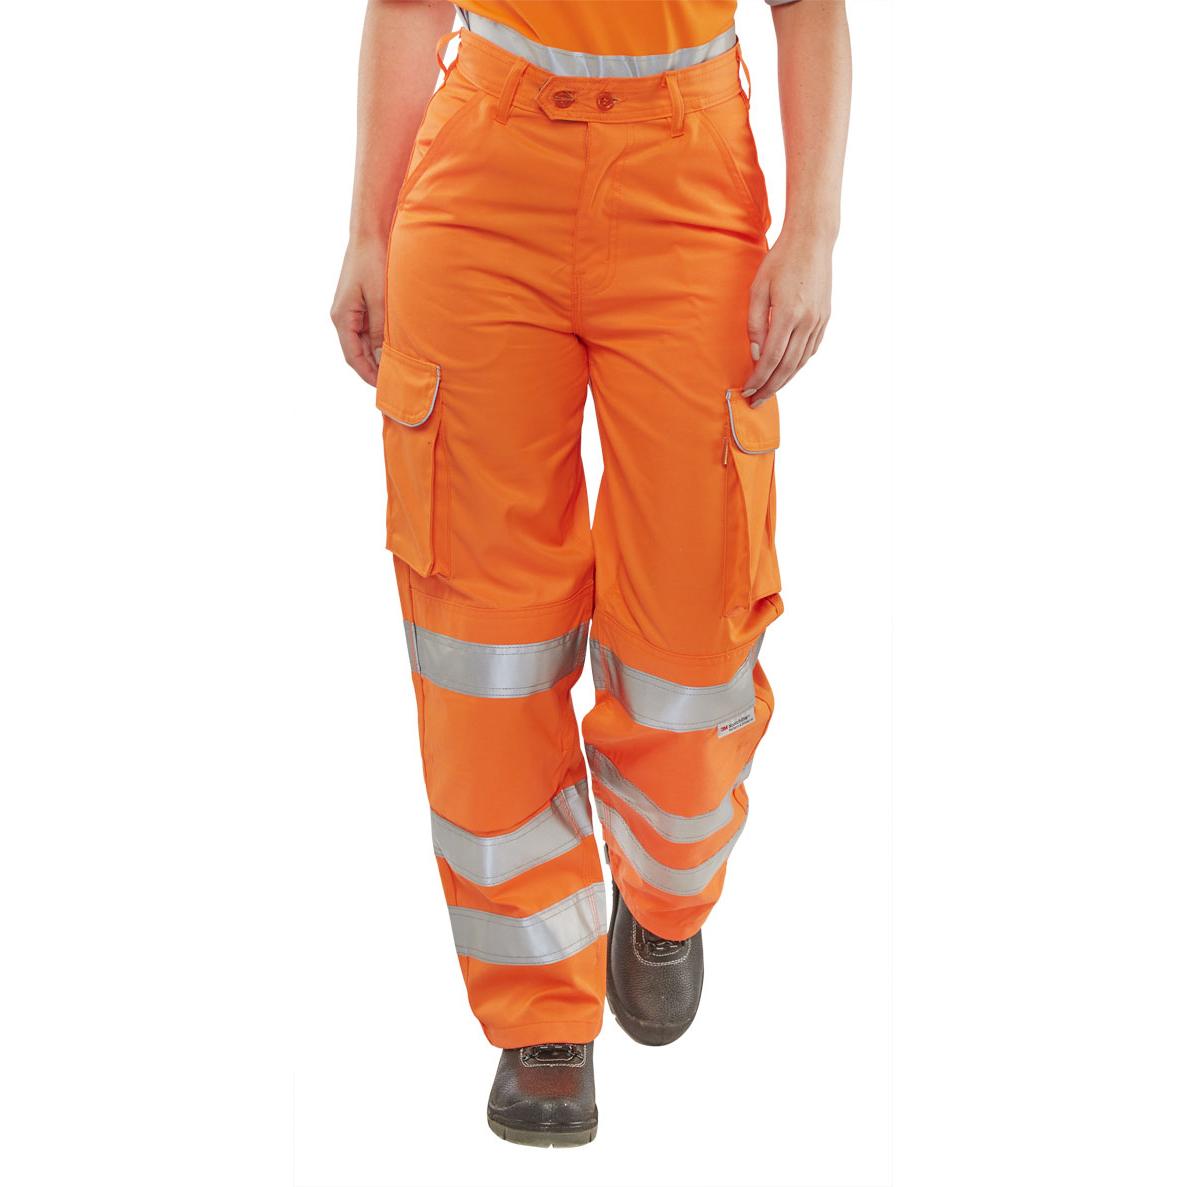 BSeen Rail Spec Trousers Ladies Teflon Hi-Vis Reflective Orange 32 Ref LRST32 *Up to 3 Day Leadtime*